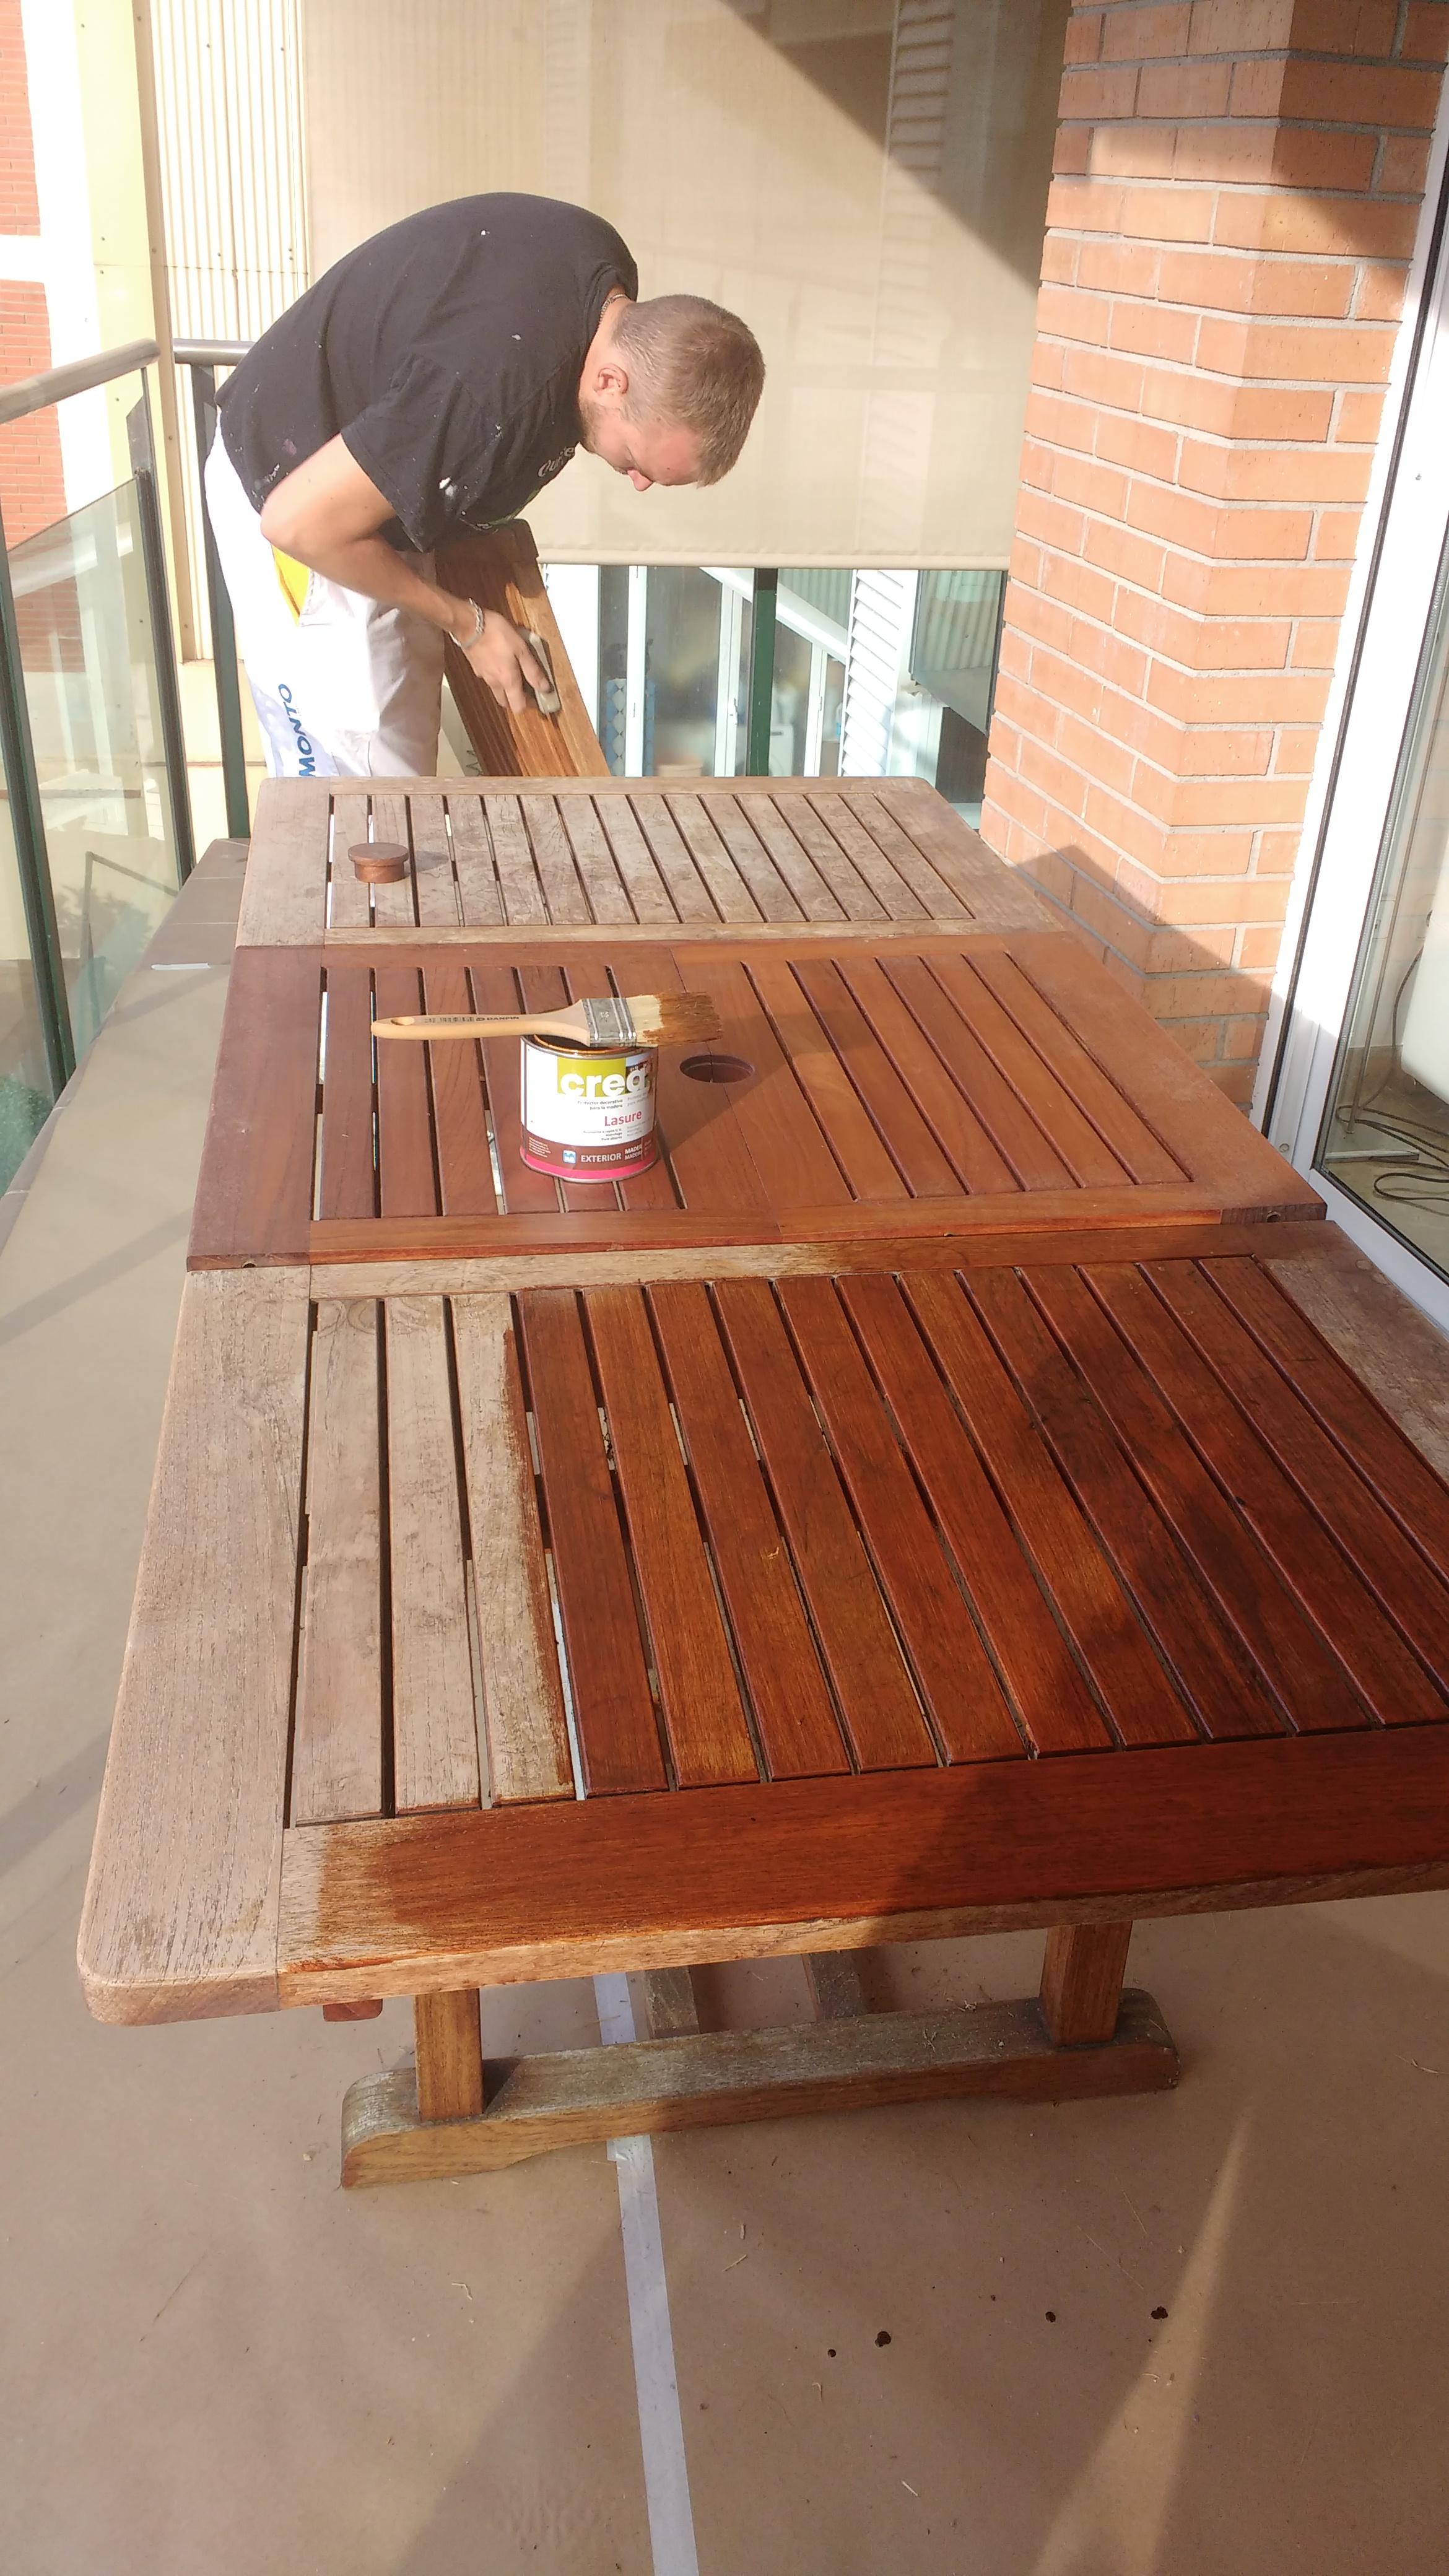 Mesas de exterior de madera fotos gratis mesa cubierta - Mesa madera exterior ...